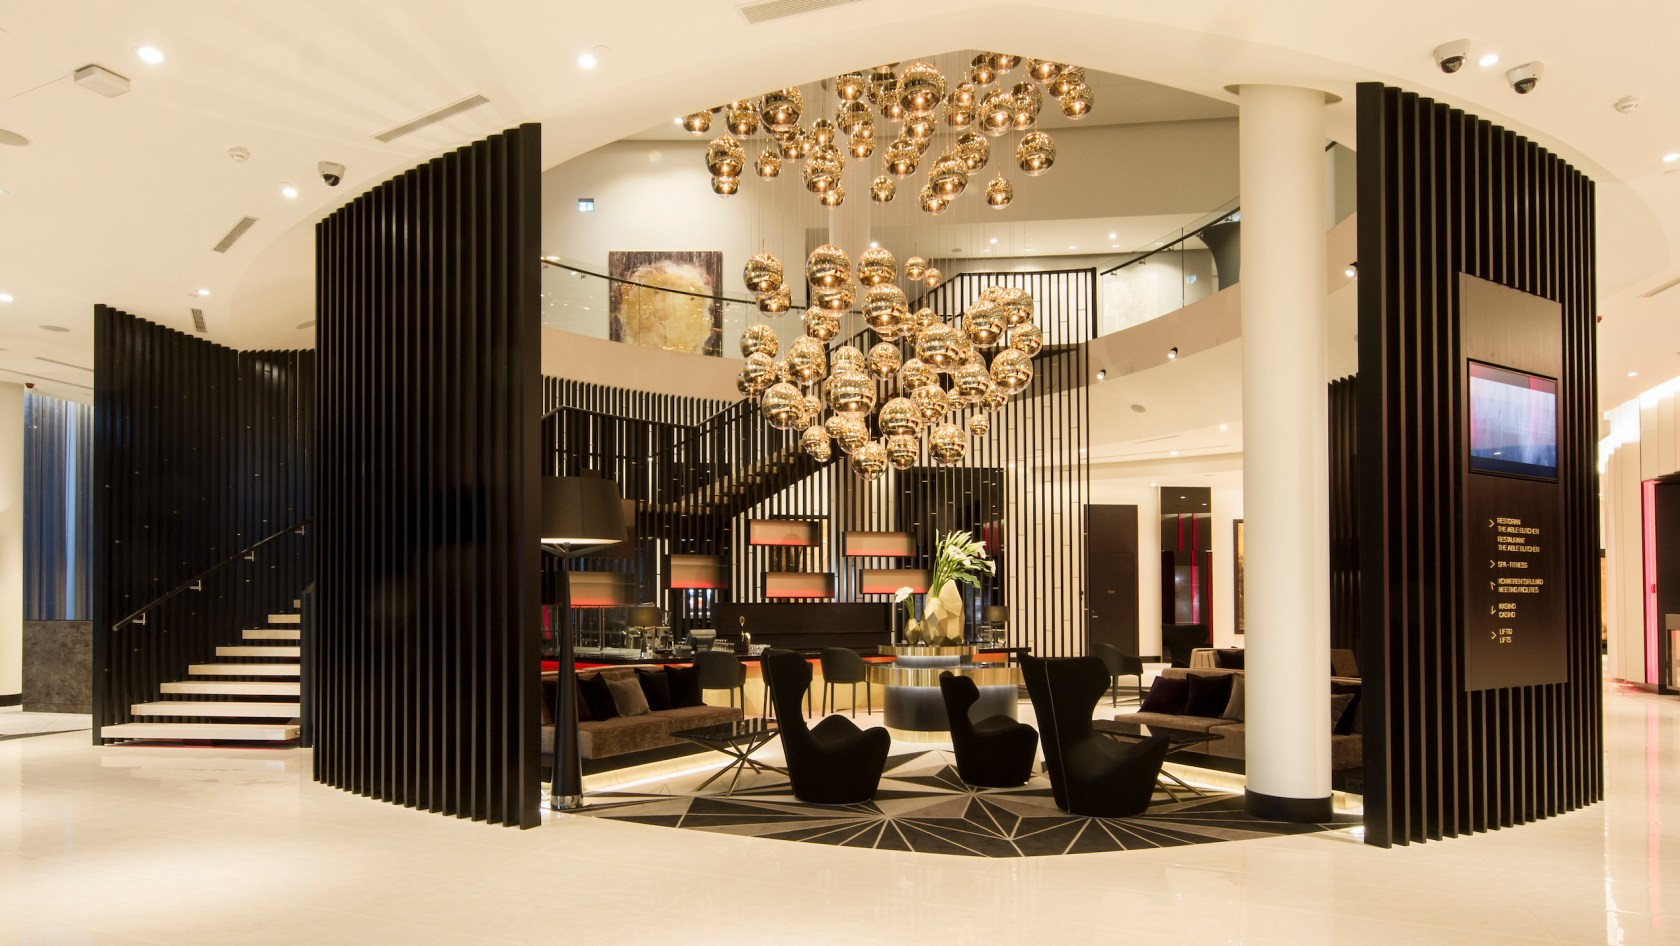 Hilton Park Hotel Tallinn - Architizer